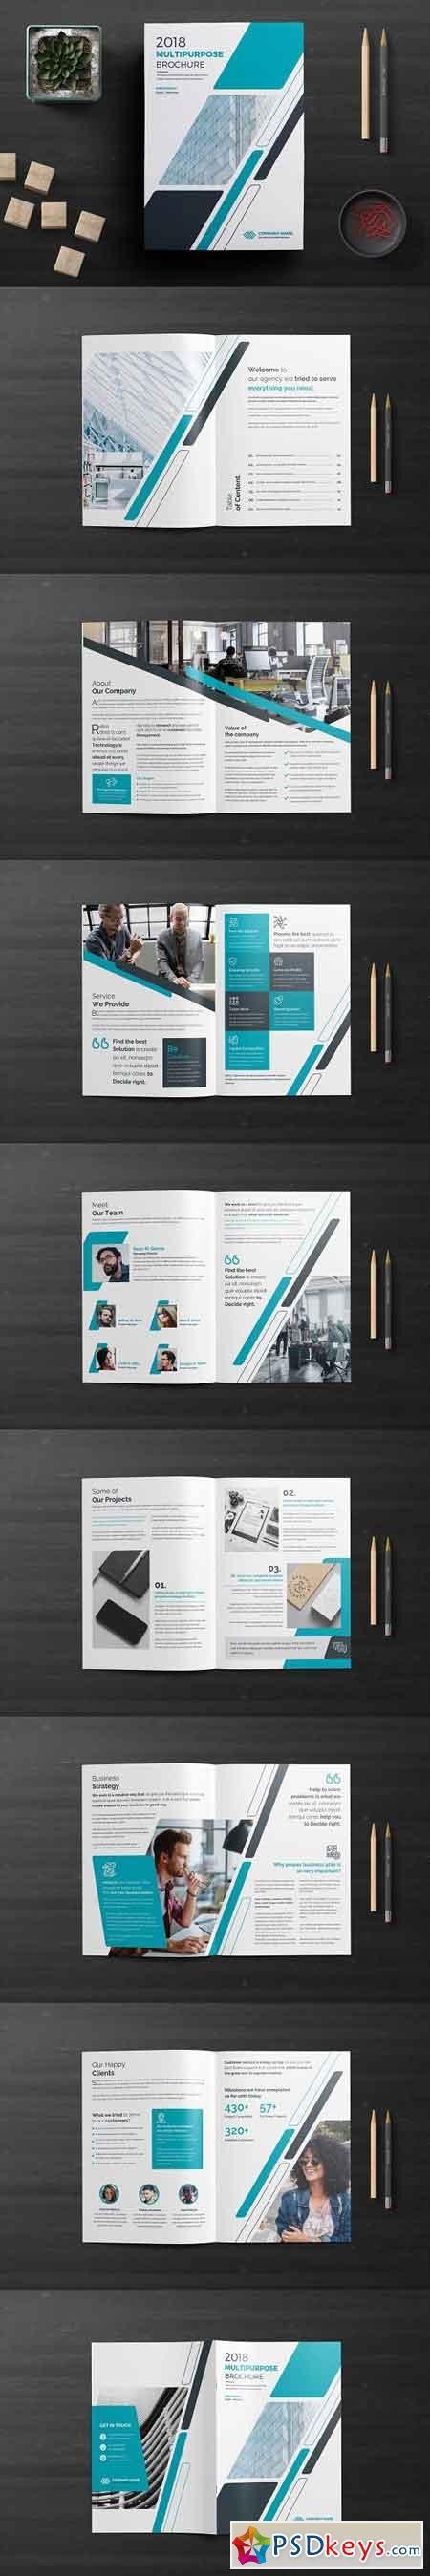 Company Profile Business Brochure 2977541